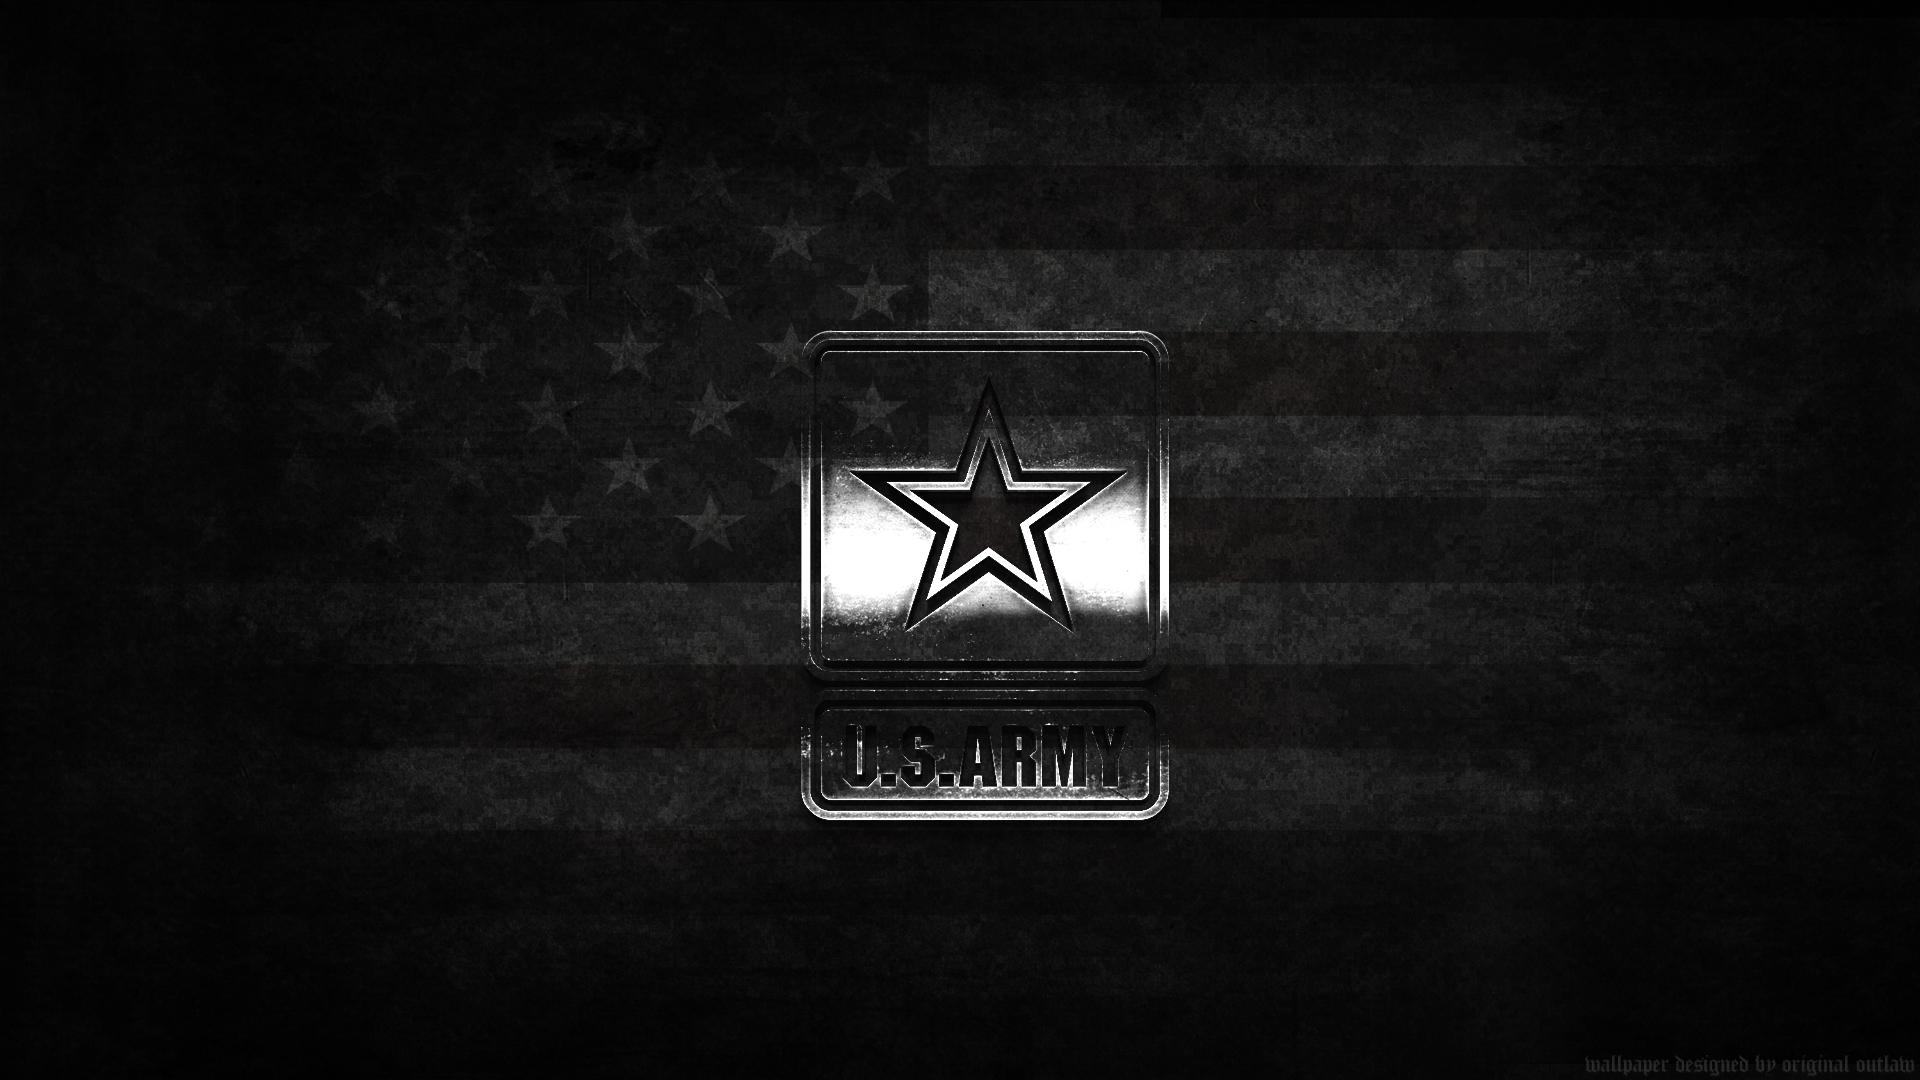 US Army Computer Backgrounds Desktop Image 1920x1080